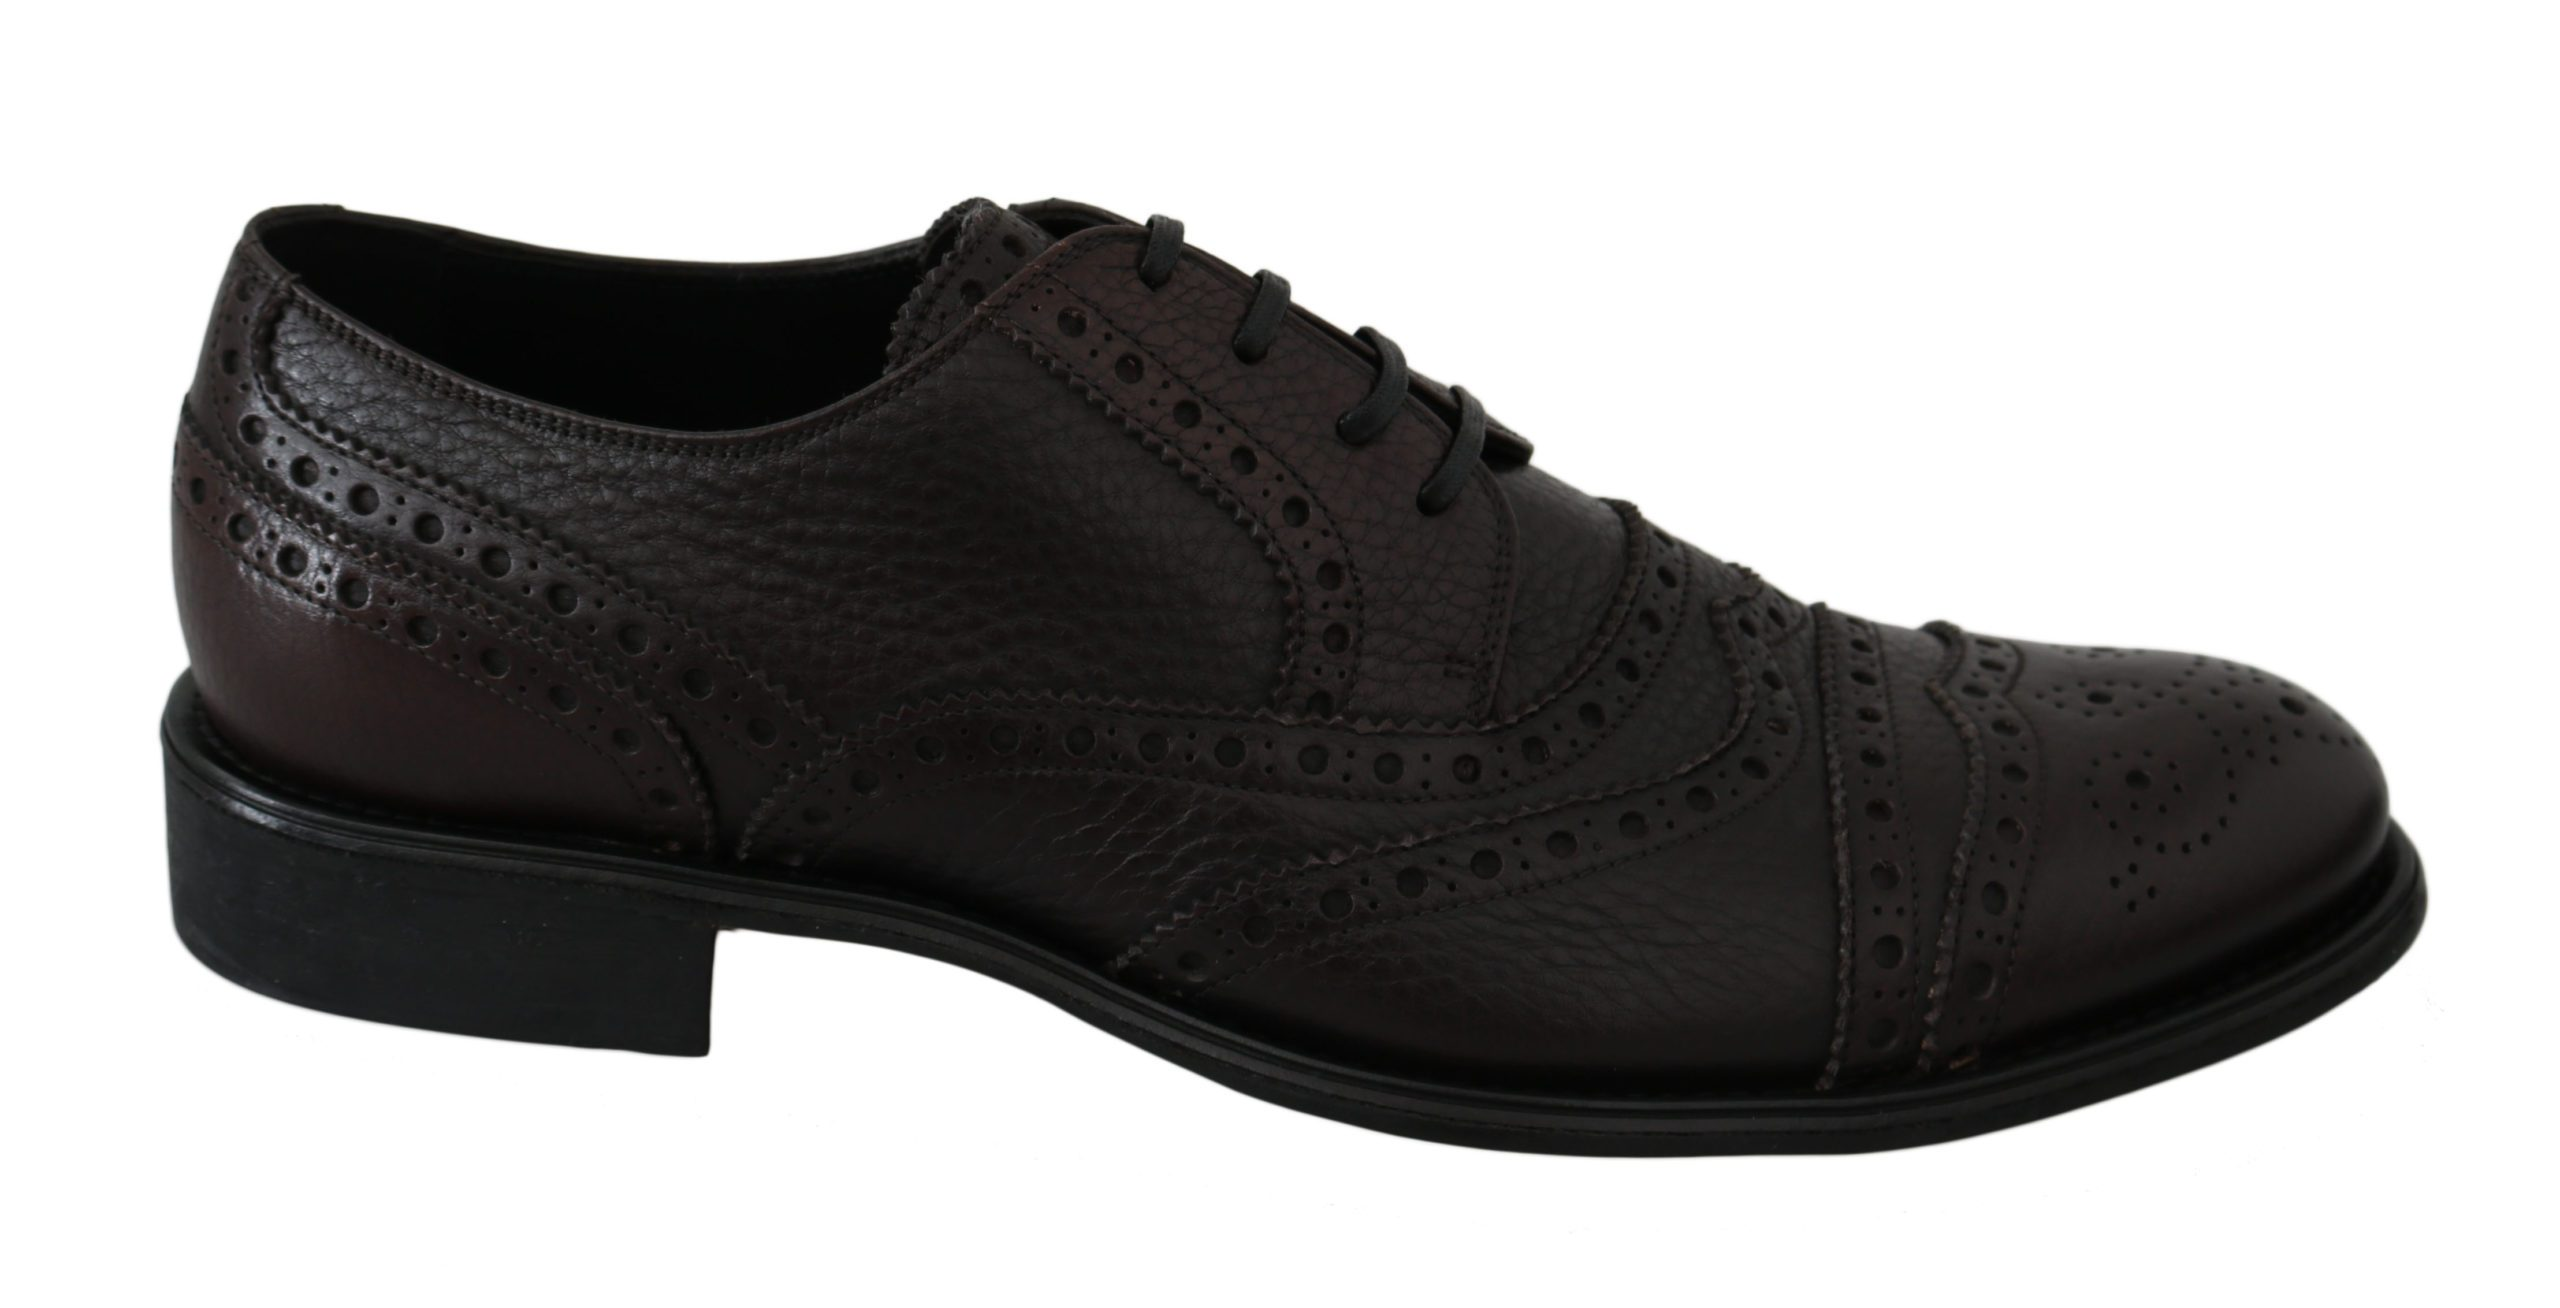 Dolce & Gabbana Men's Leather Dress Brogue Shoes Black MV2542 - EU39/US6